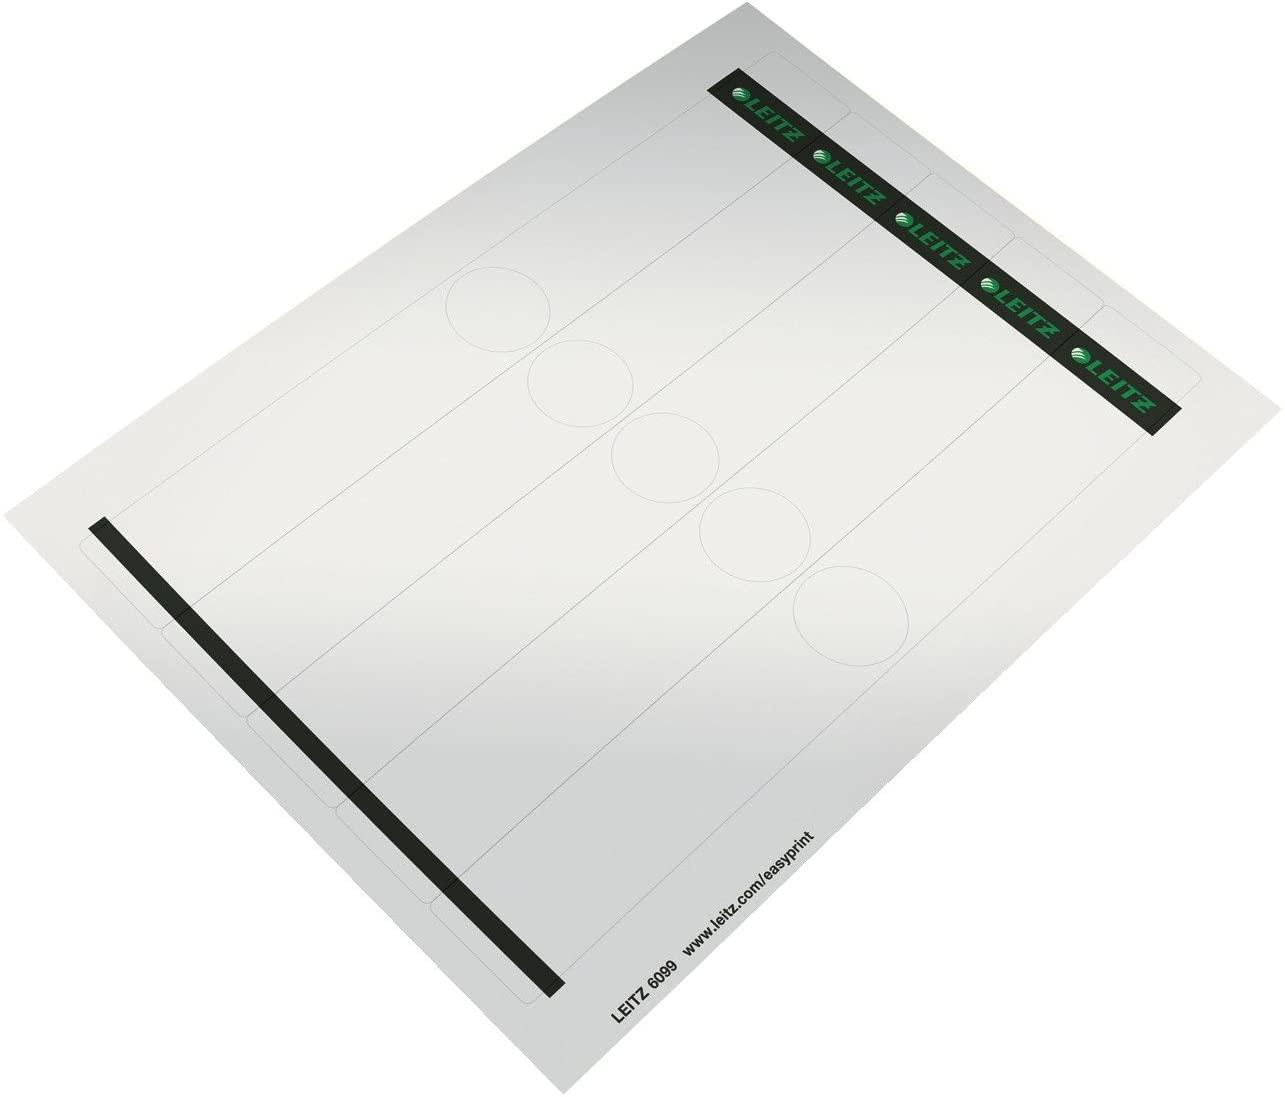 Leitz 60990085 Rückenschild selbstklebend PC, Papier, schmal, 125 Stück, grau